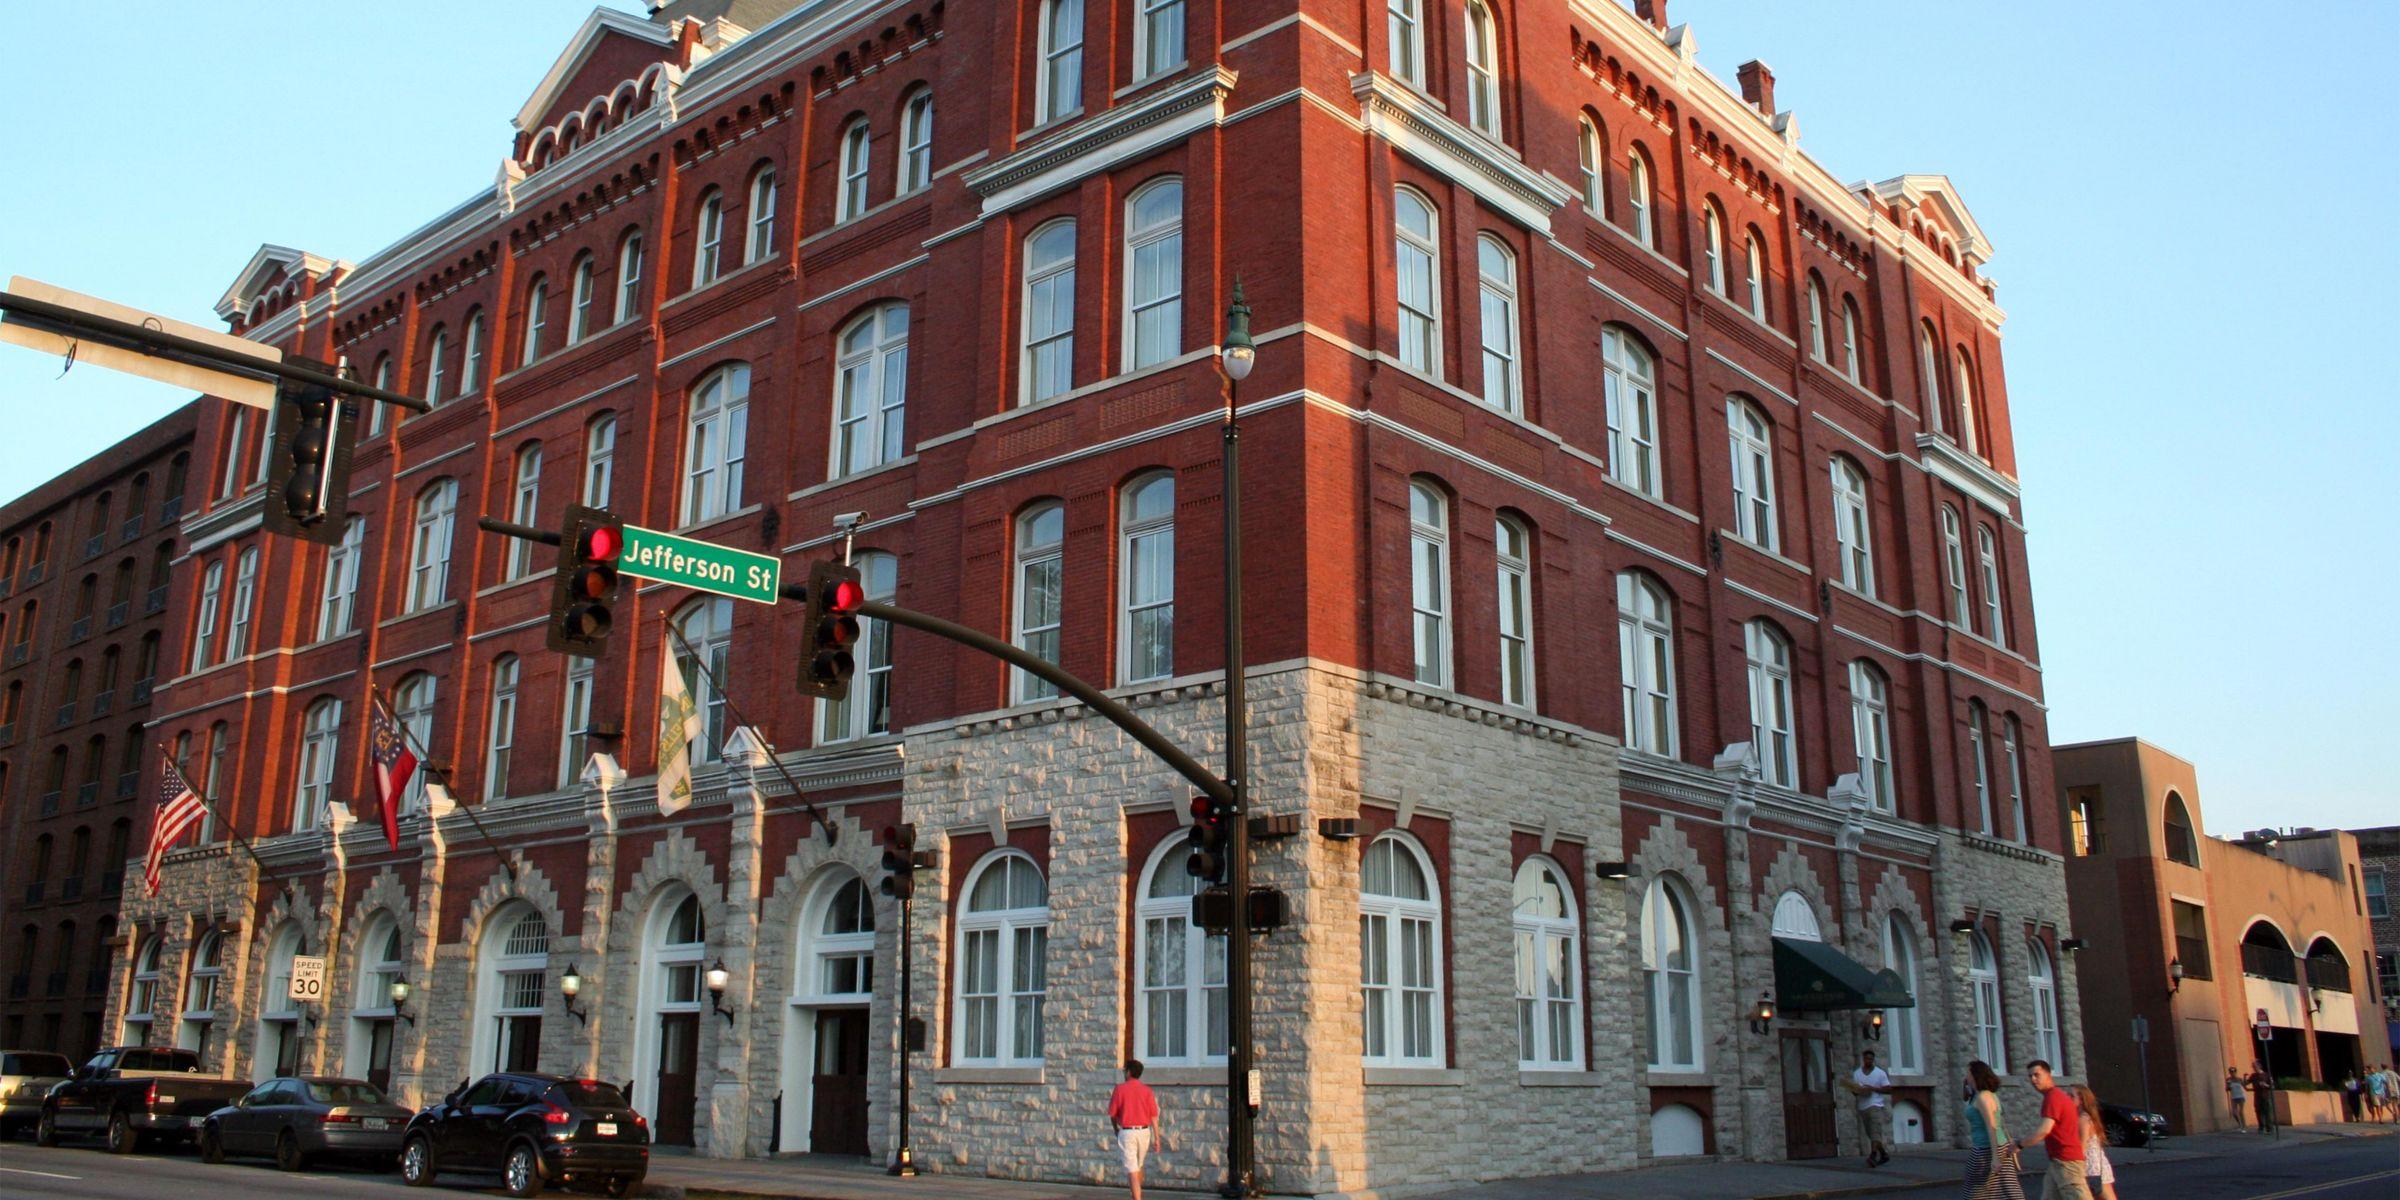 Hotel Indigo Savannah Historic District Exterior